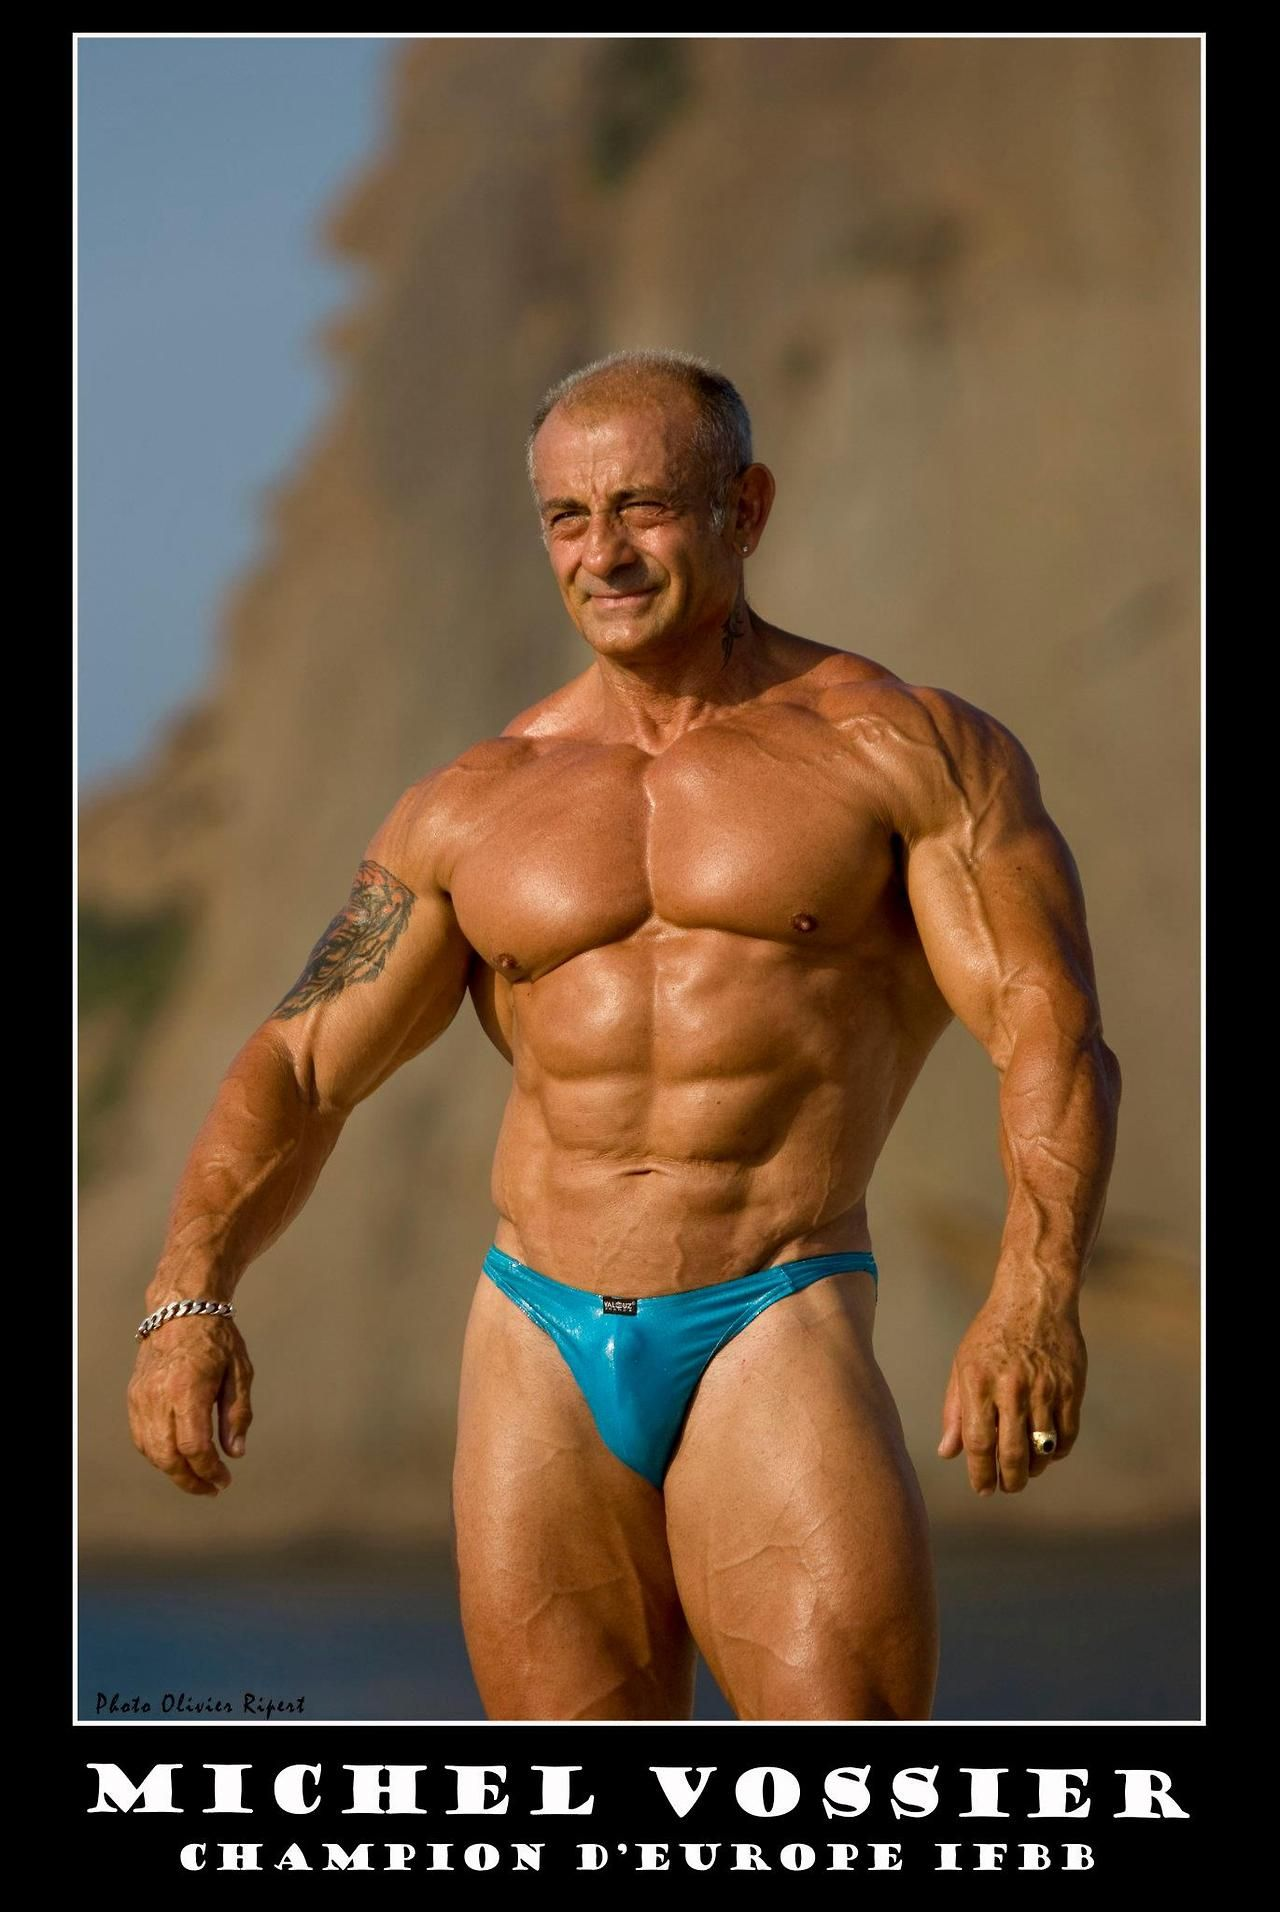 Michel Vossier | mature muscle | Pinterest | Muscles ...